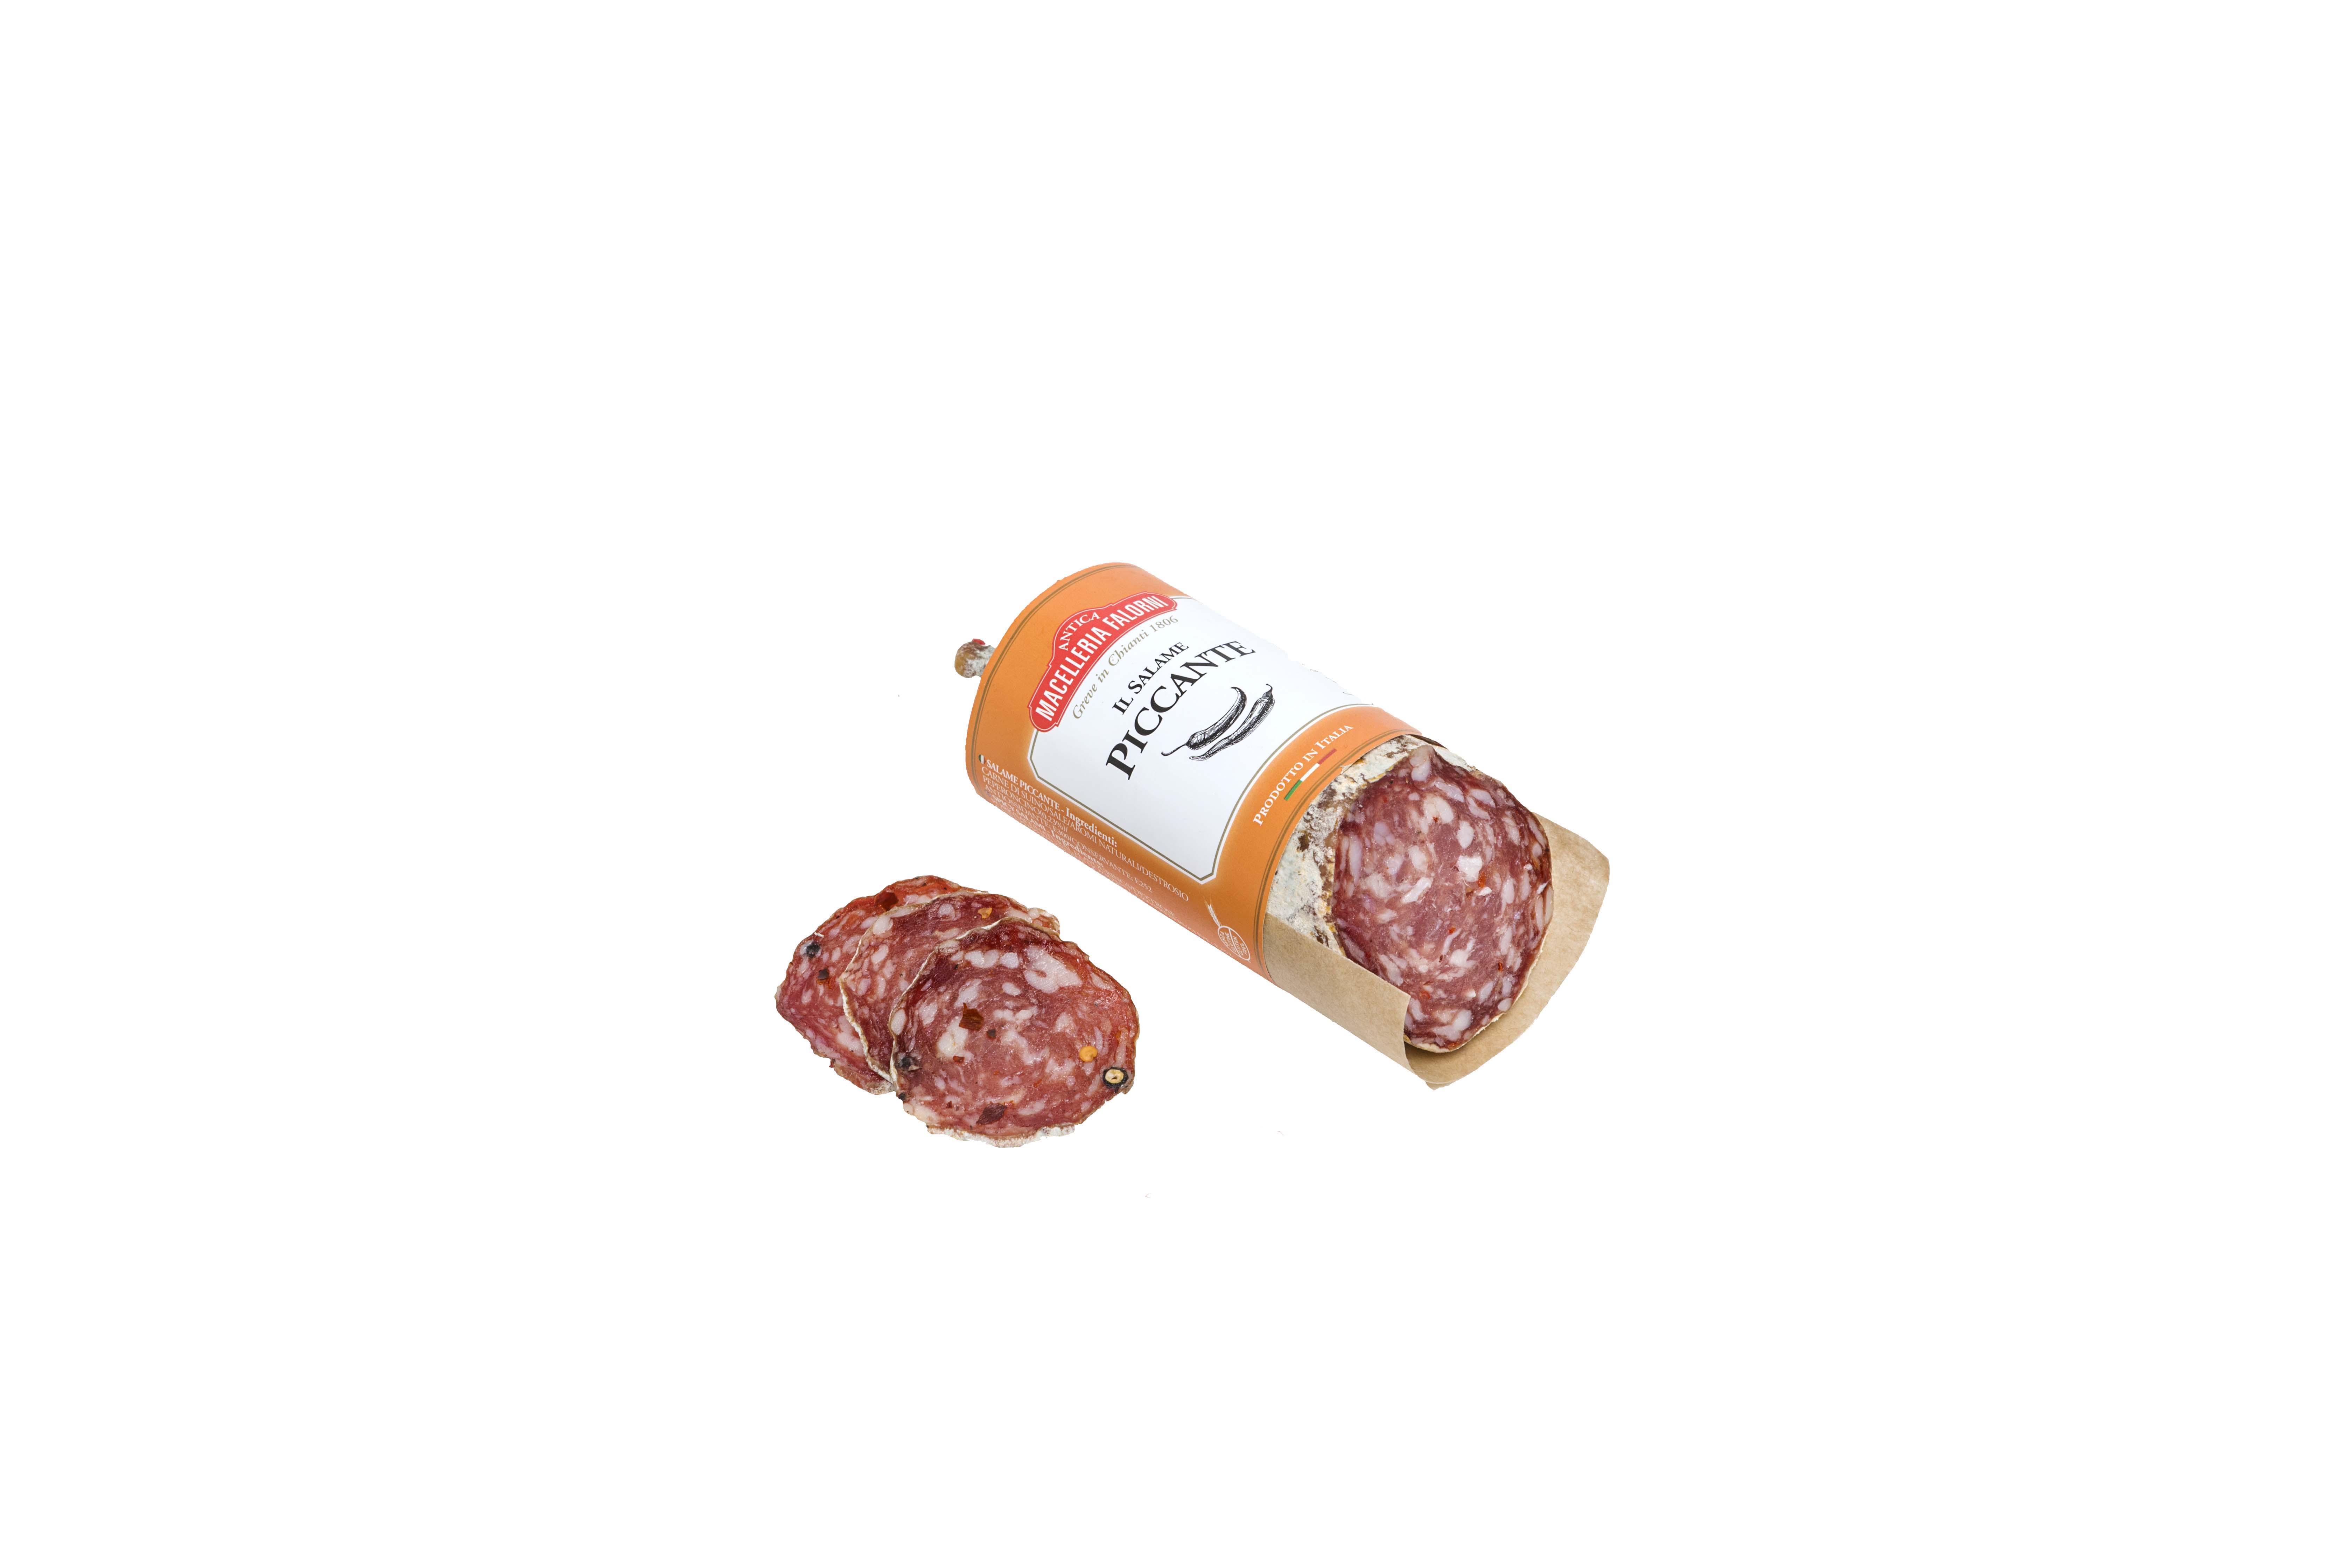 Salame piccante 175 g Falorni